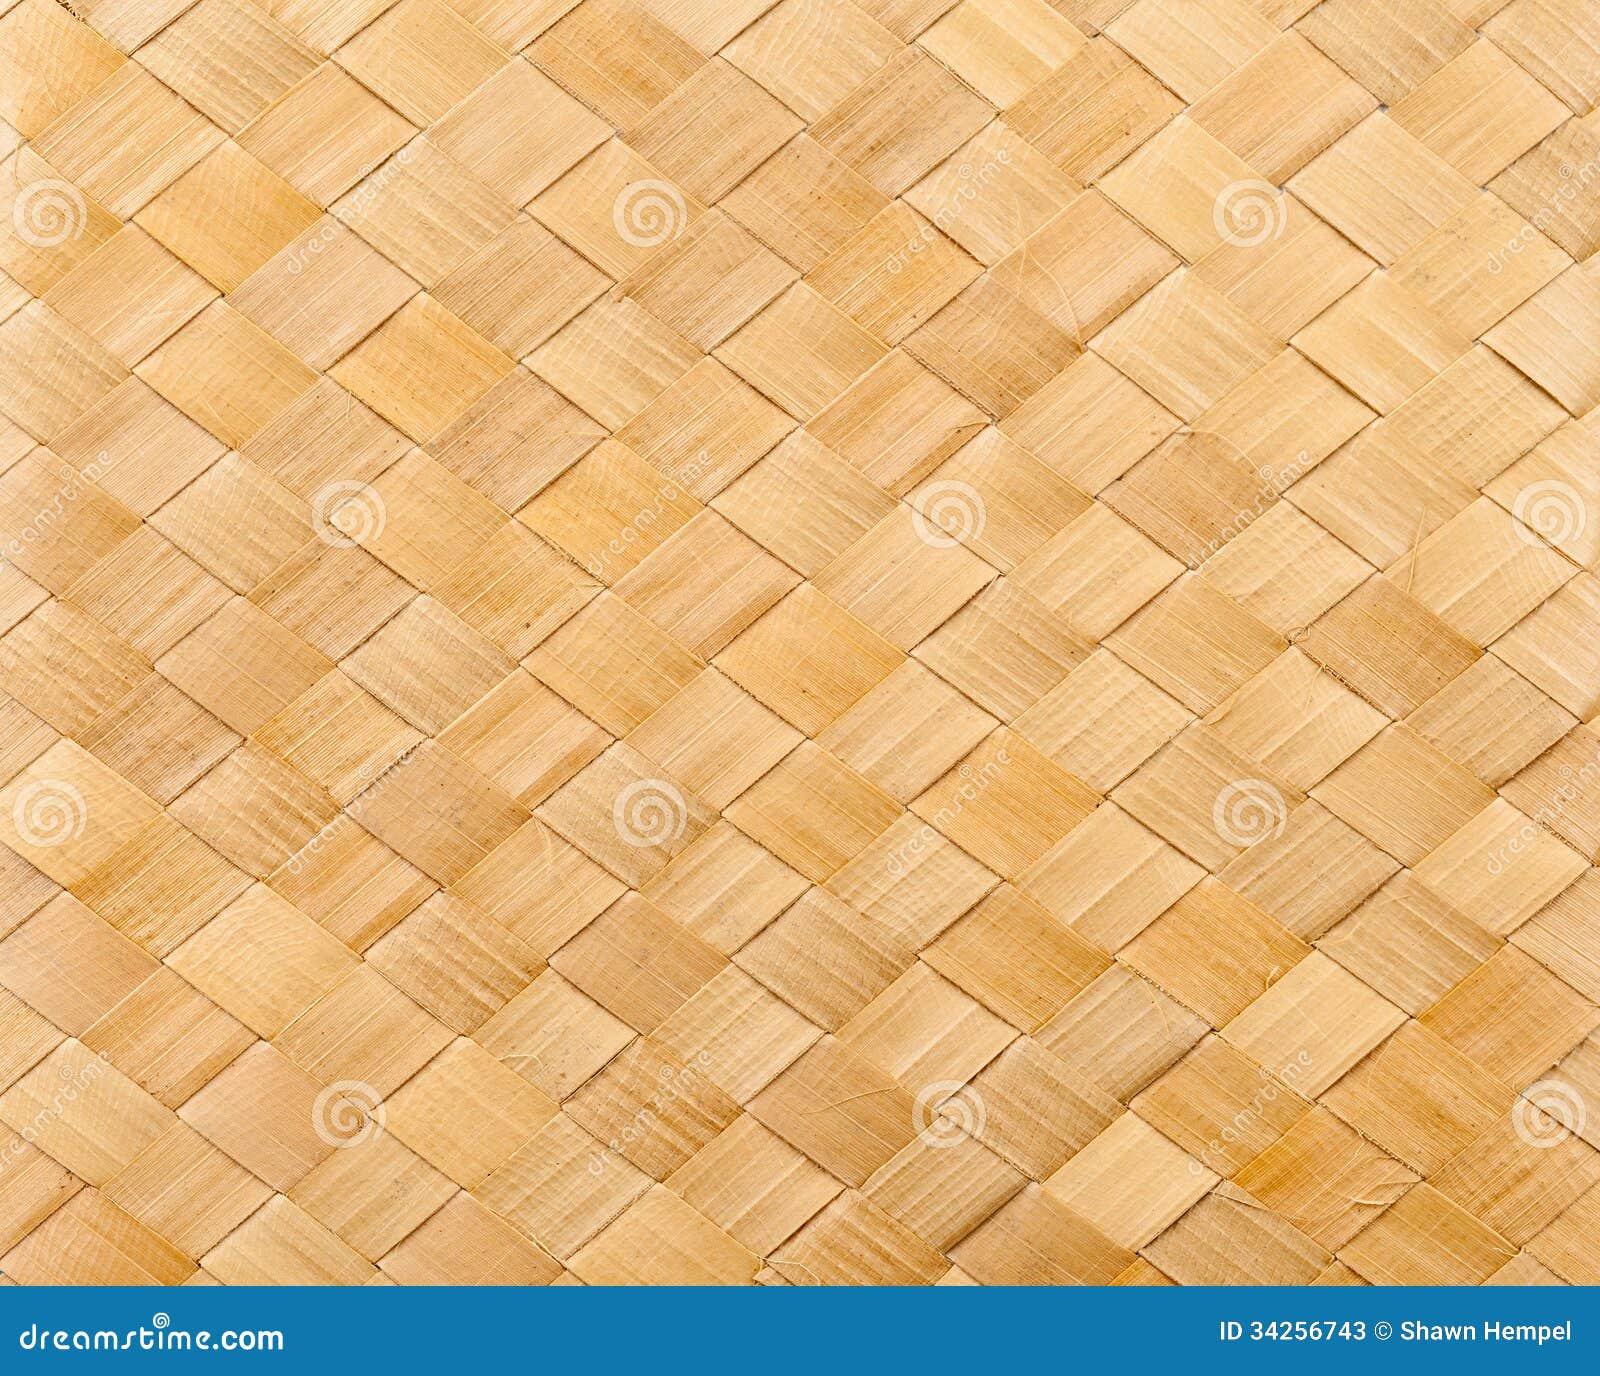 weave reed pattern - photo #43